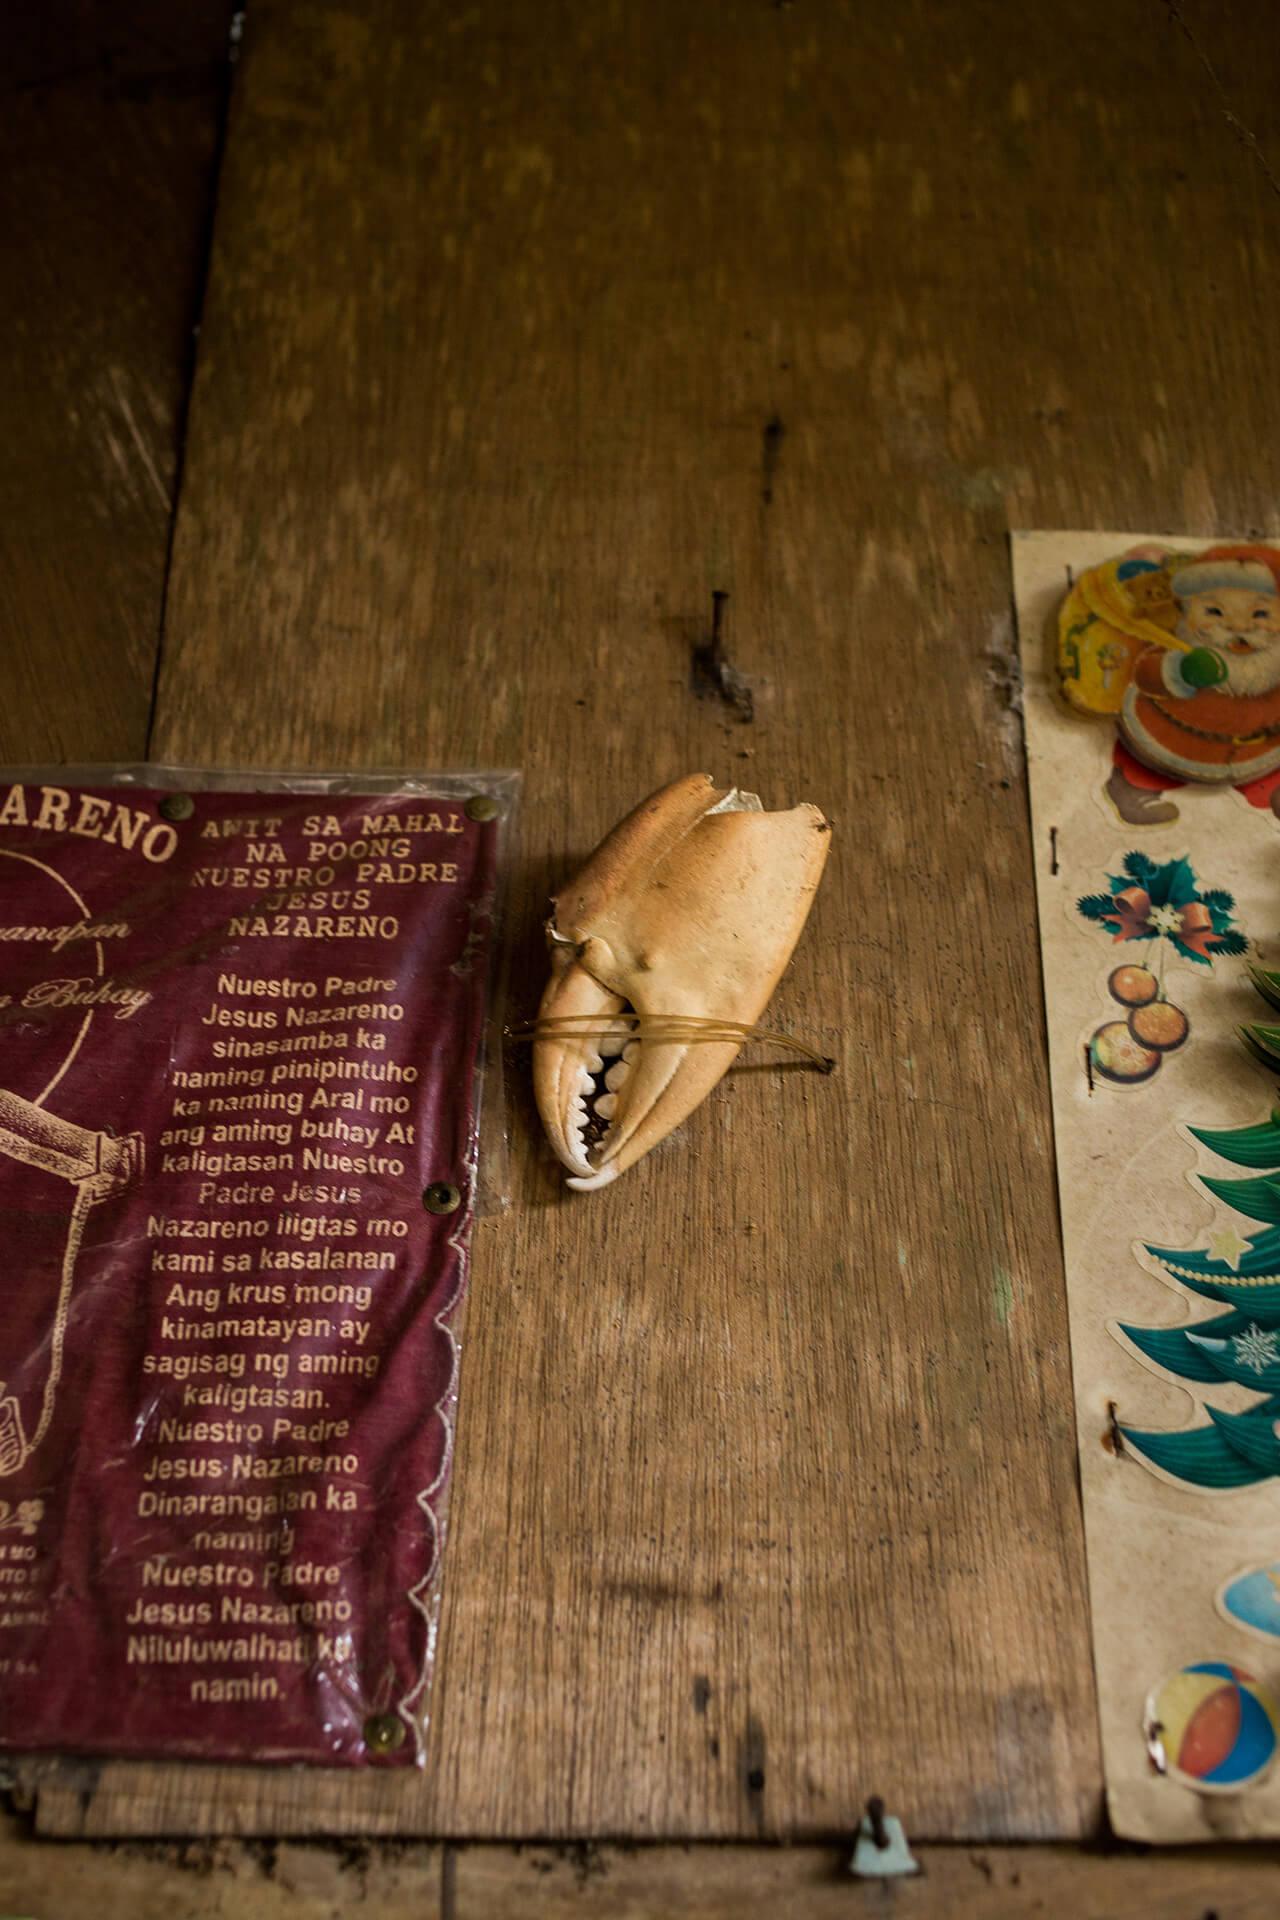 A Nazareno handkerchief, crab claw talisman, and Christmas decor